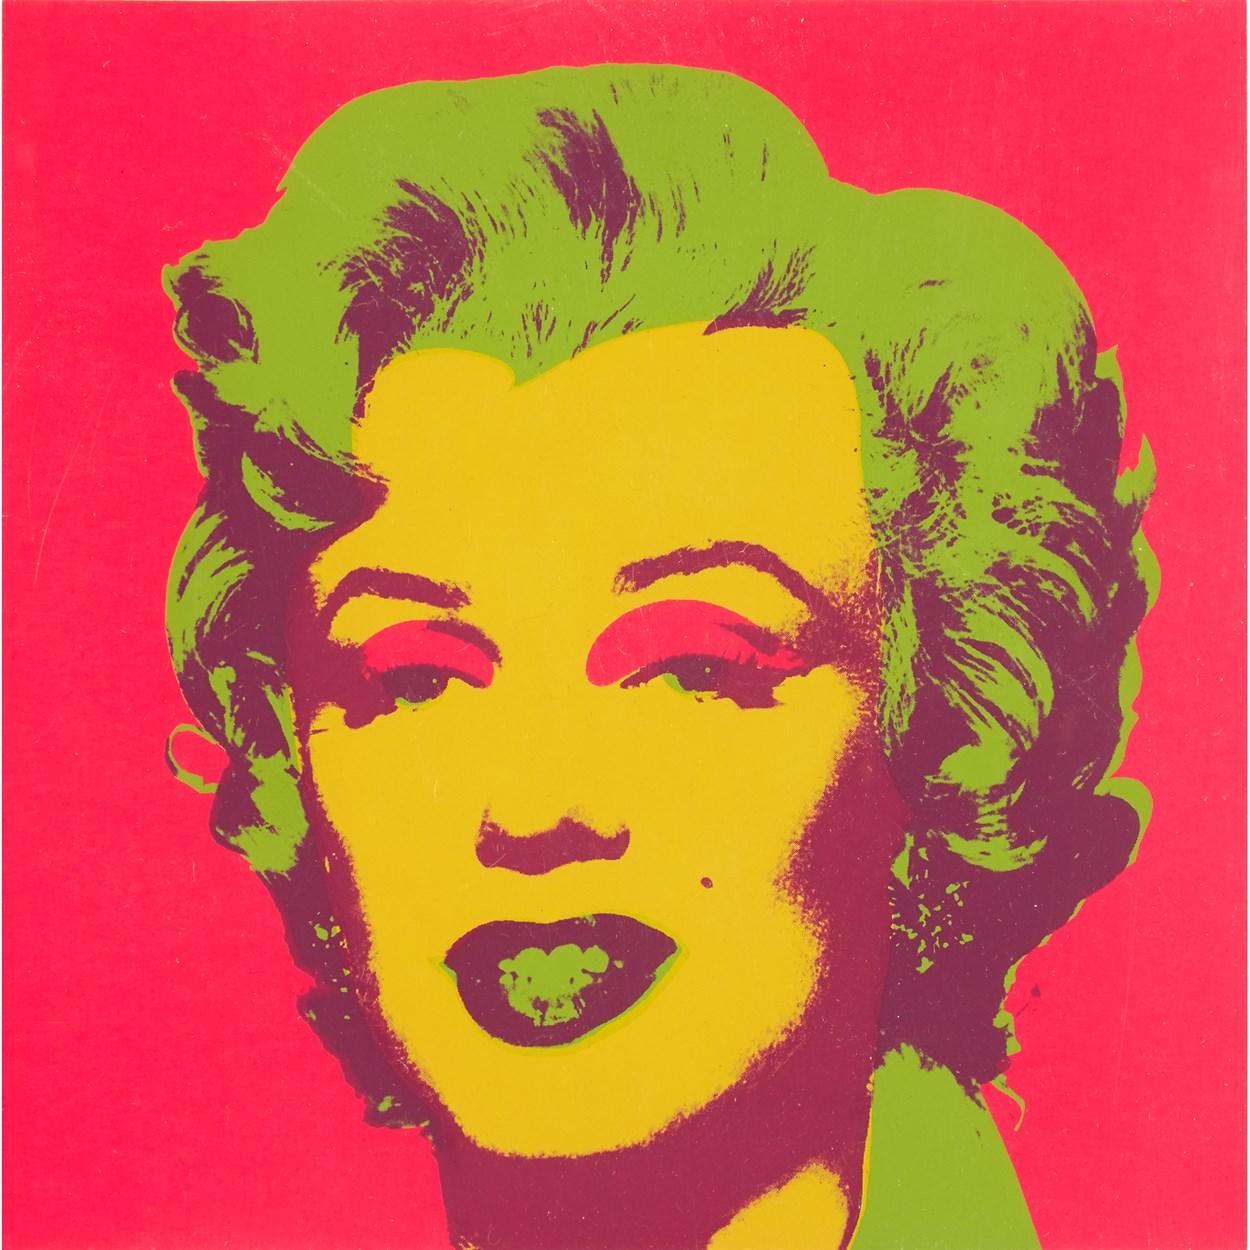 Lot 56 - Andy Warhol (American, 1928-1987)